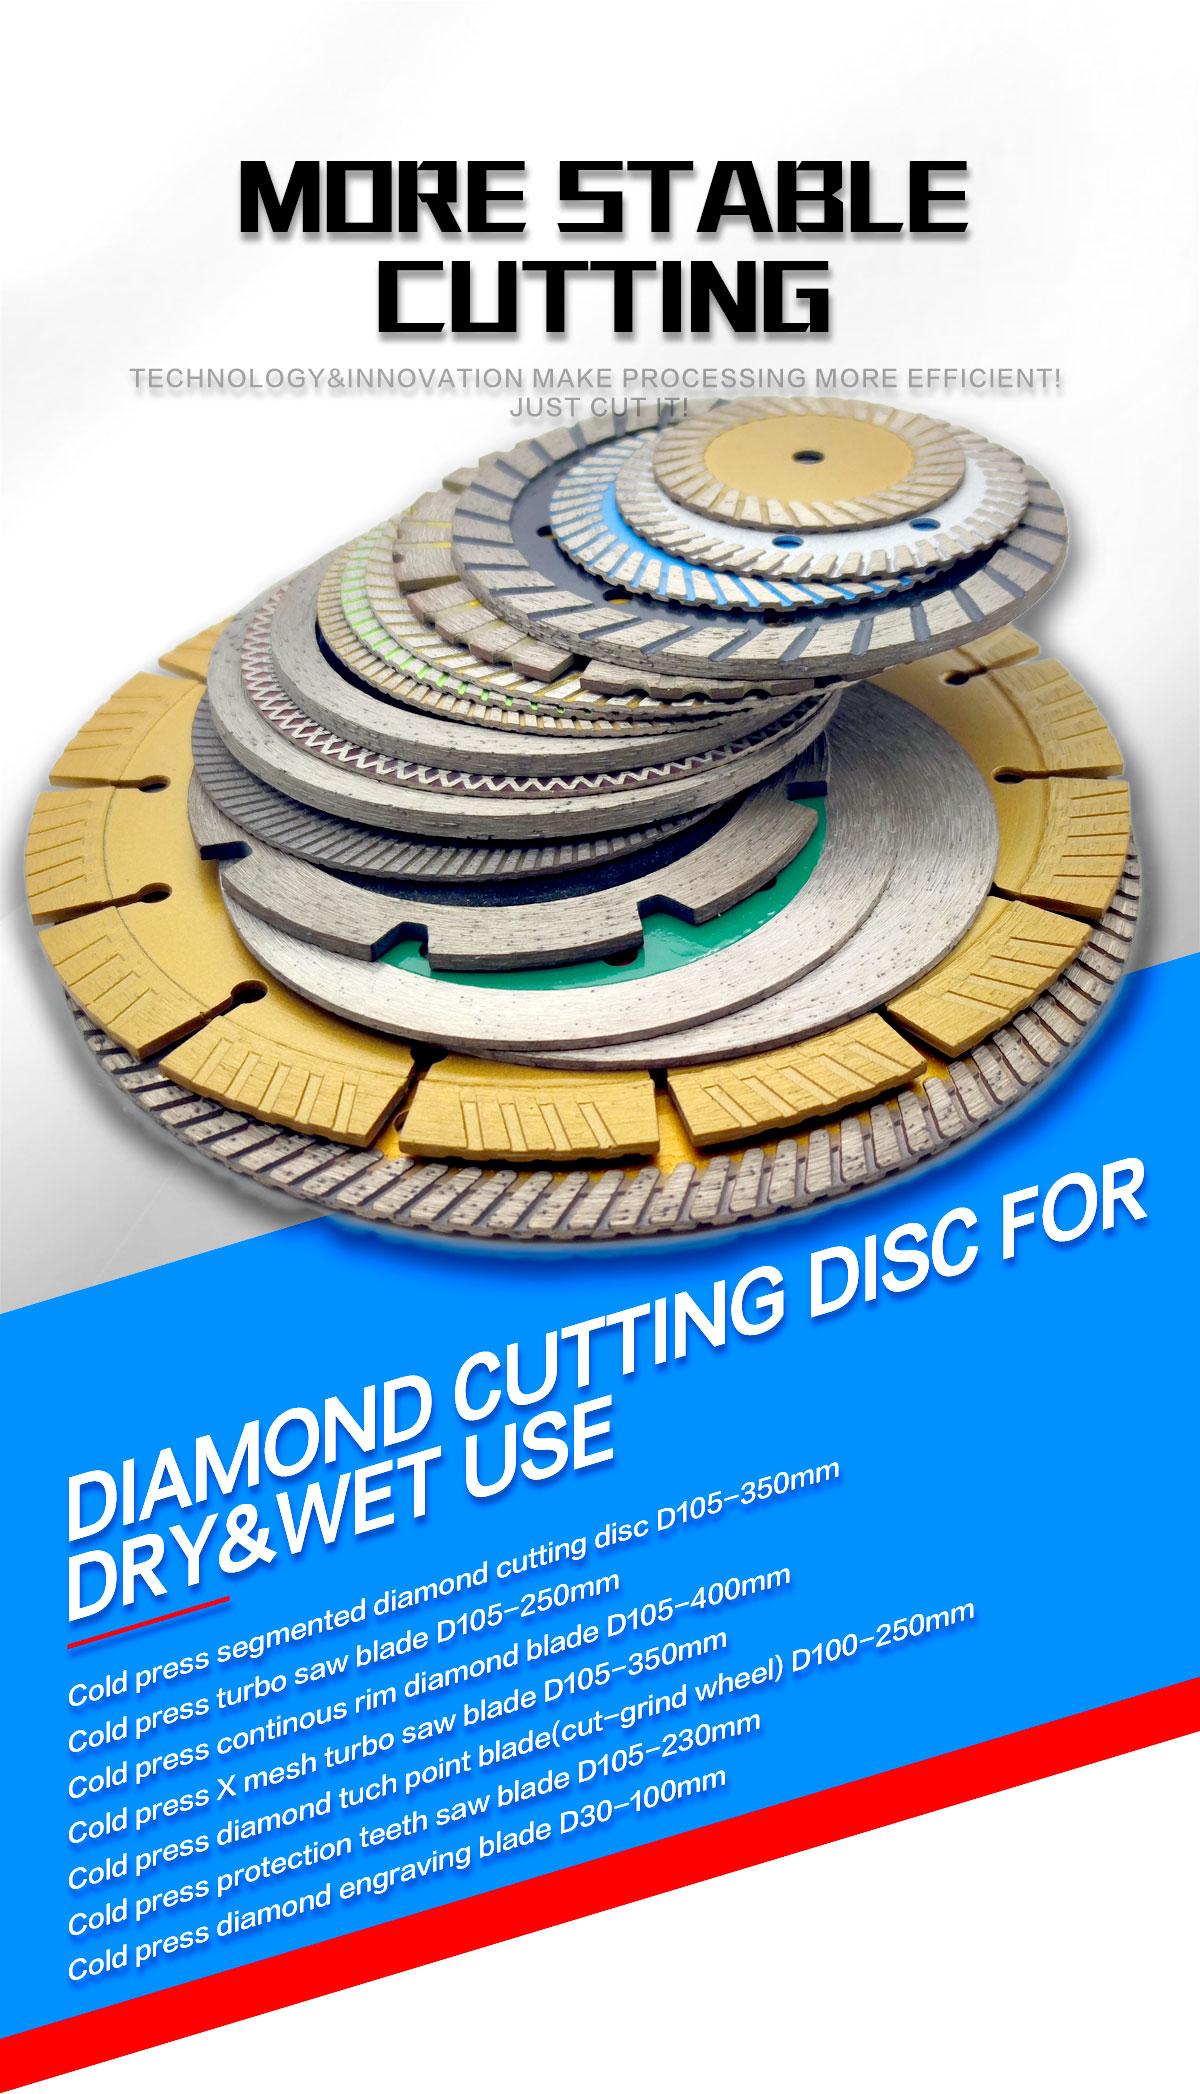 Dry cutting disc, diamond saw balde for dry cutting, diamond cutting disc for dry use